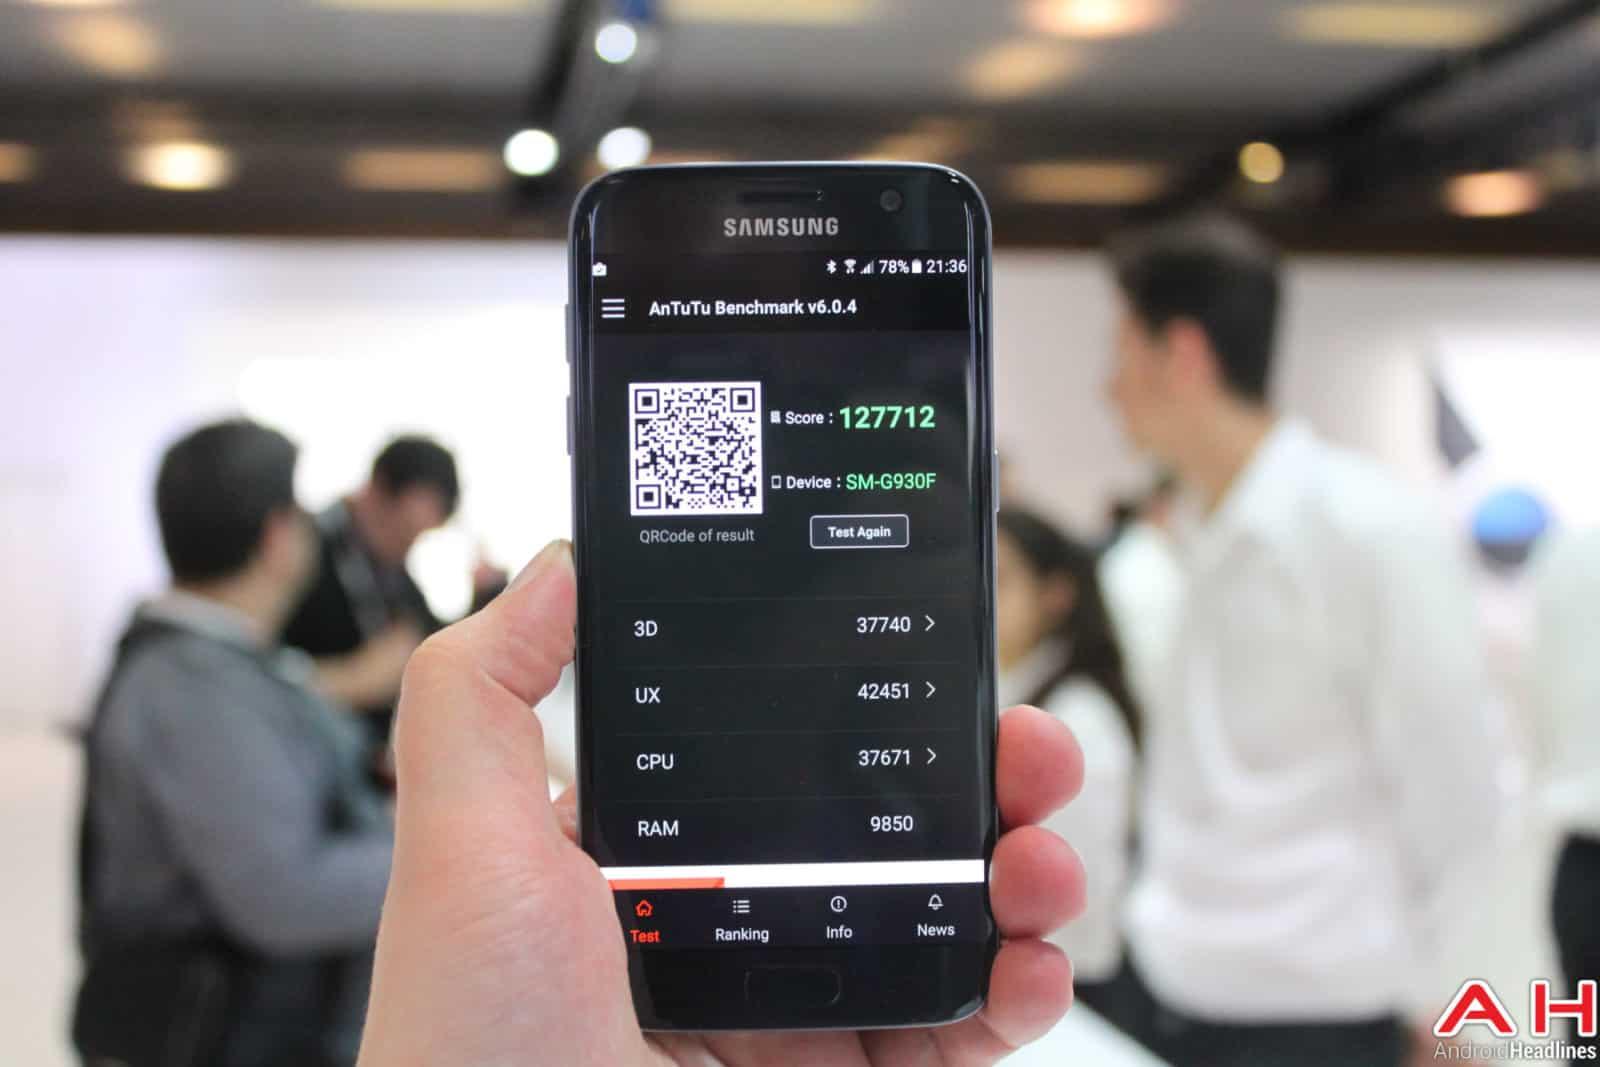 Samsung Galaxy S7 Benchmark - AnTuTu-4